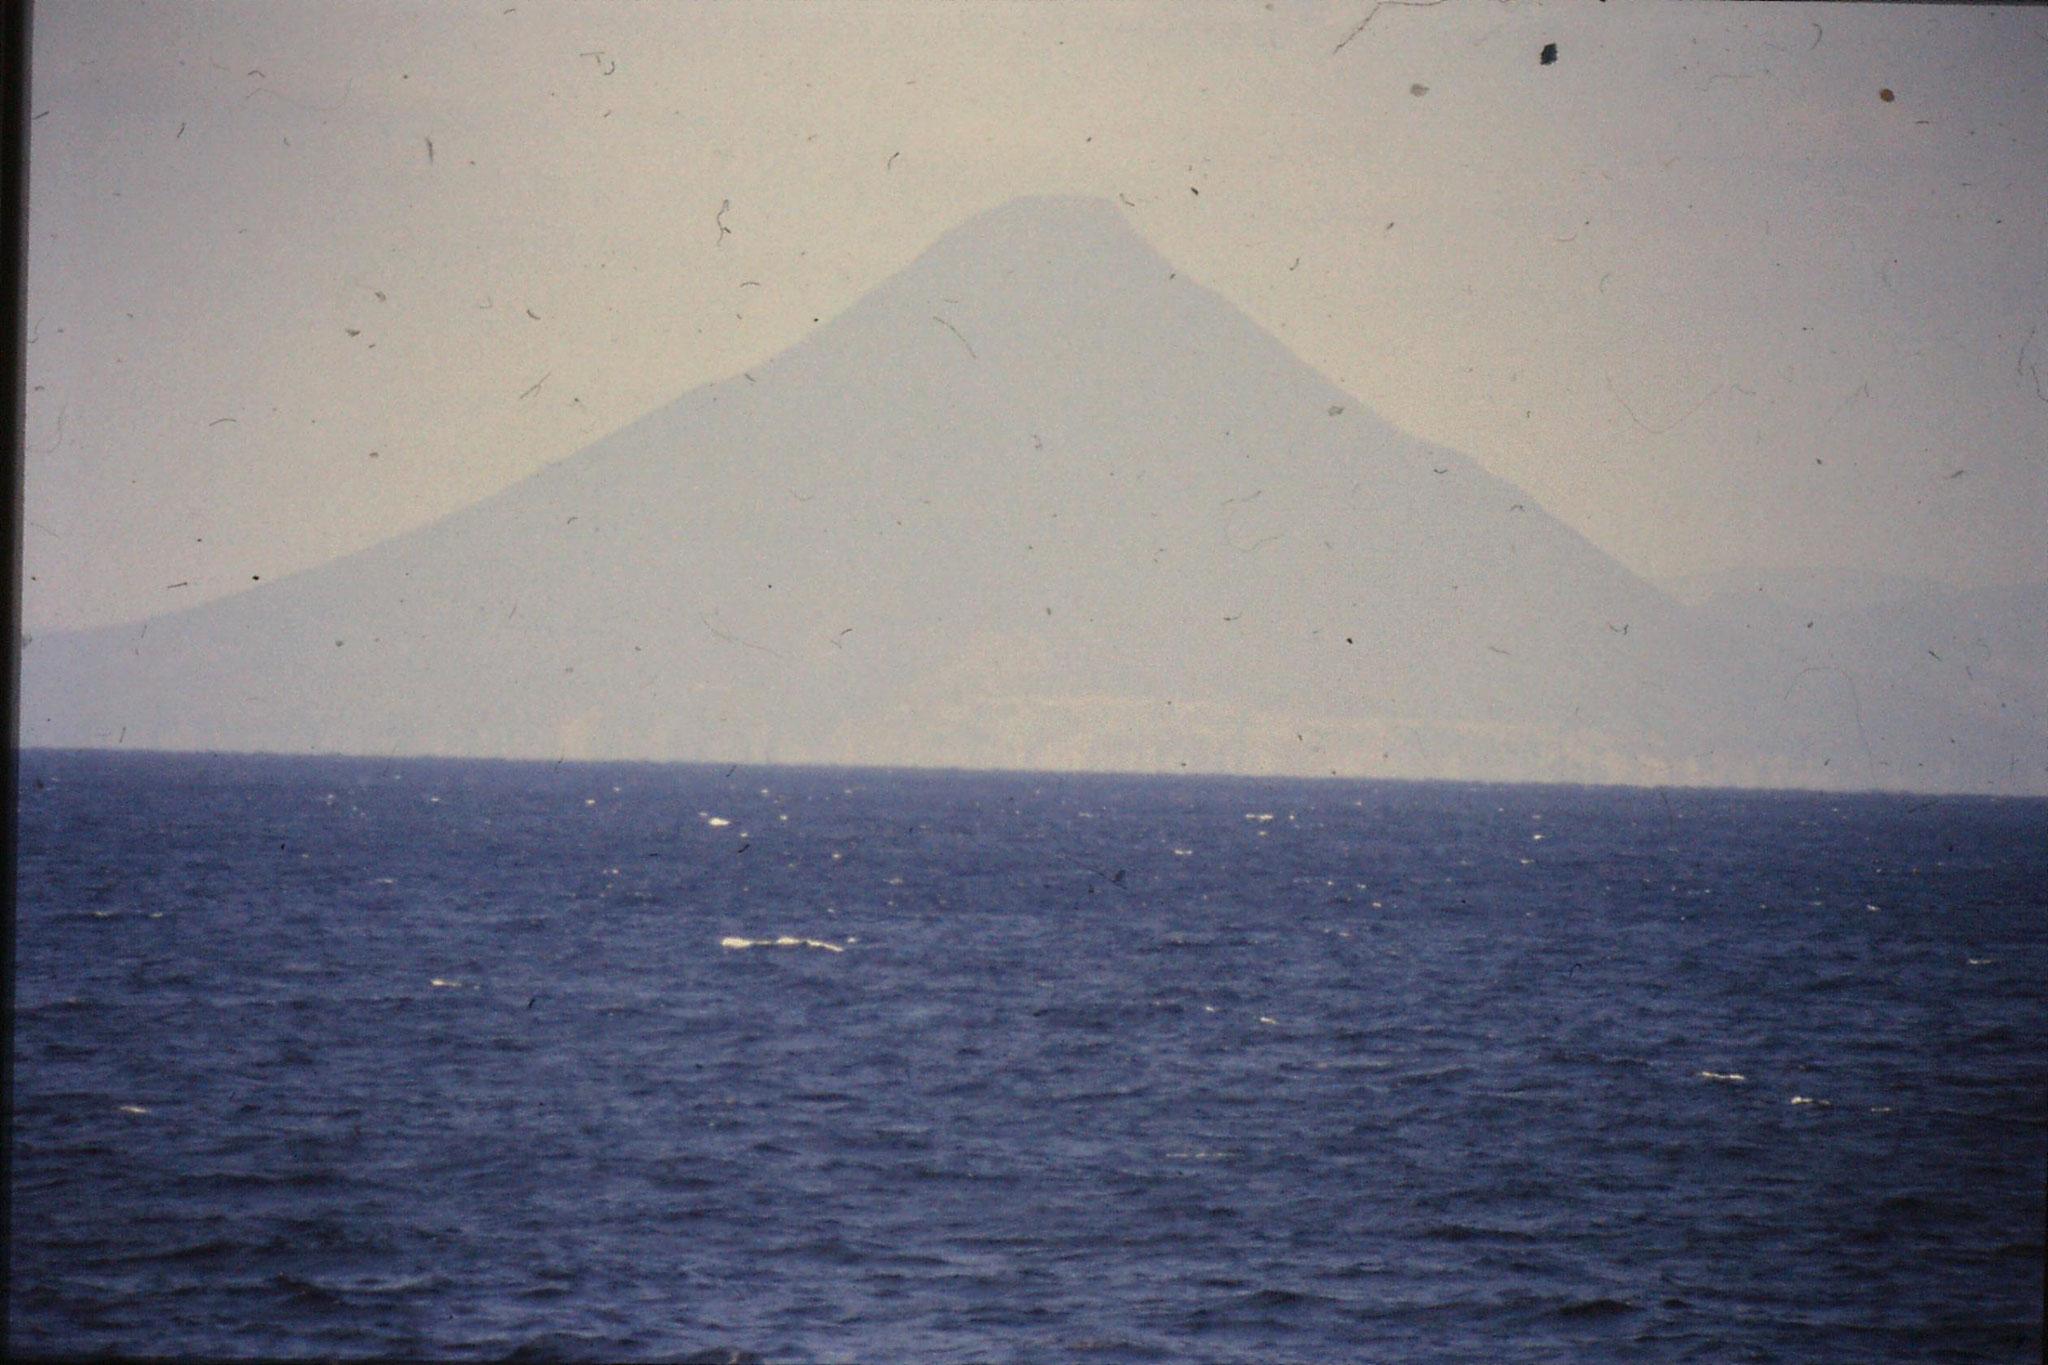 18/12/1988: 19: Mt Sakurajima